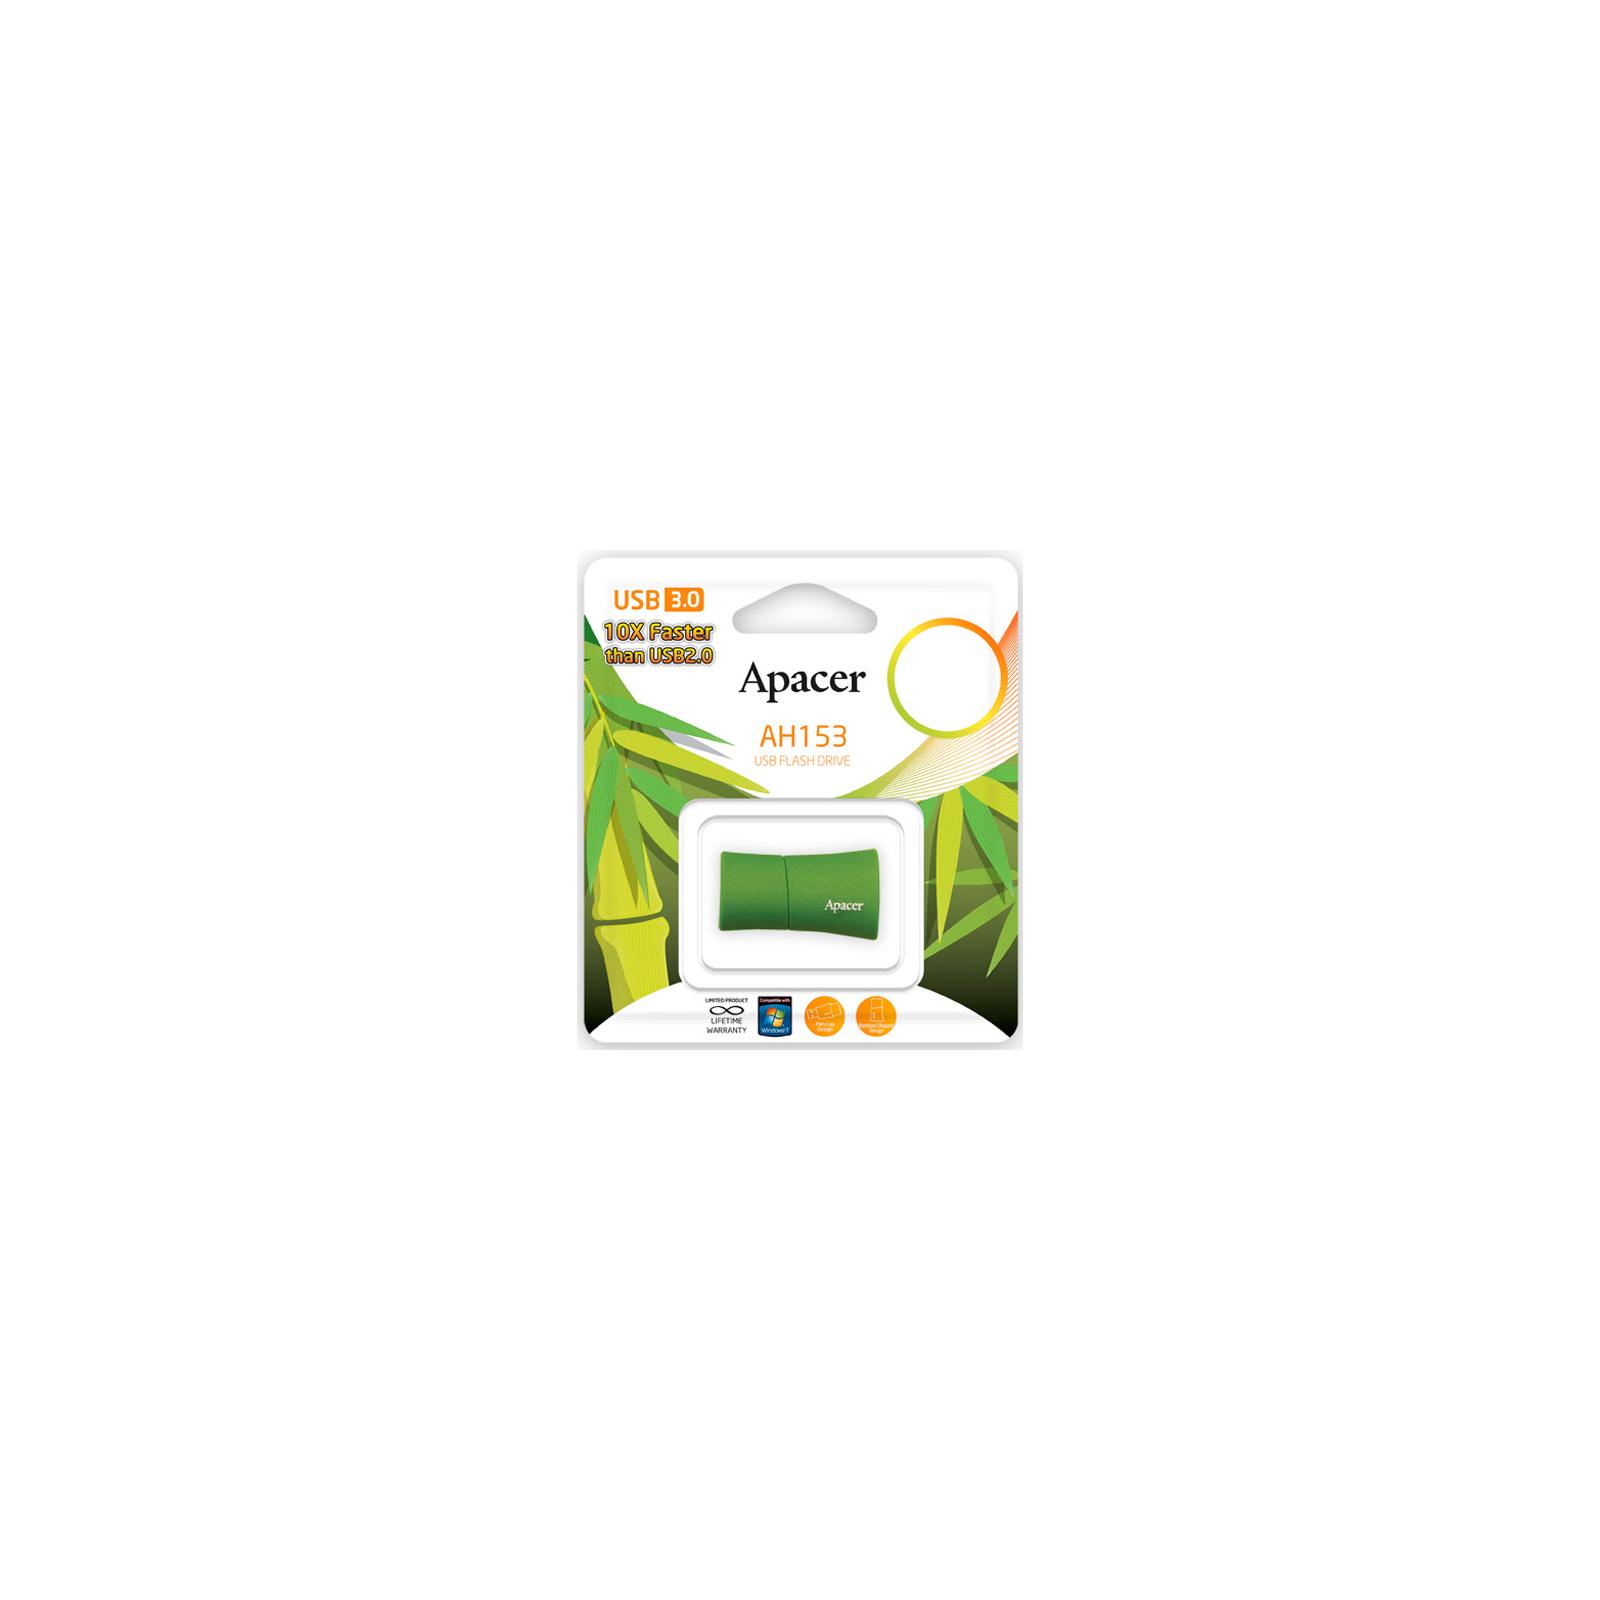 USB флеш накопитель 16GB AH153 Green RP USB3.0 Apacer (AP16GAH153G-1) изображение 5